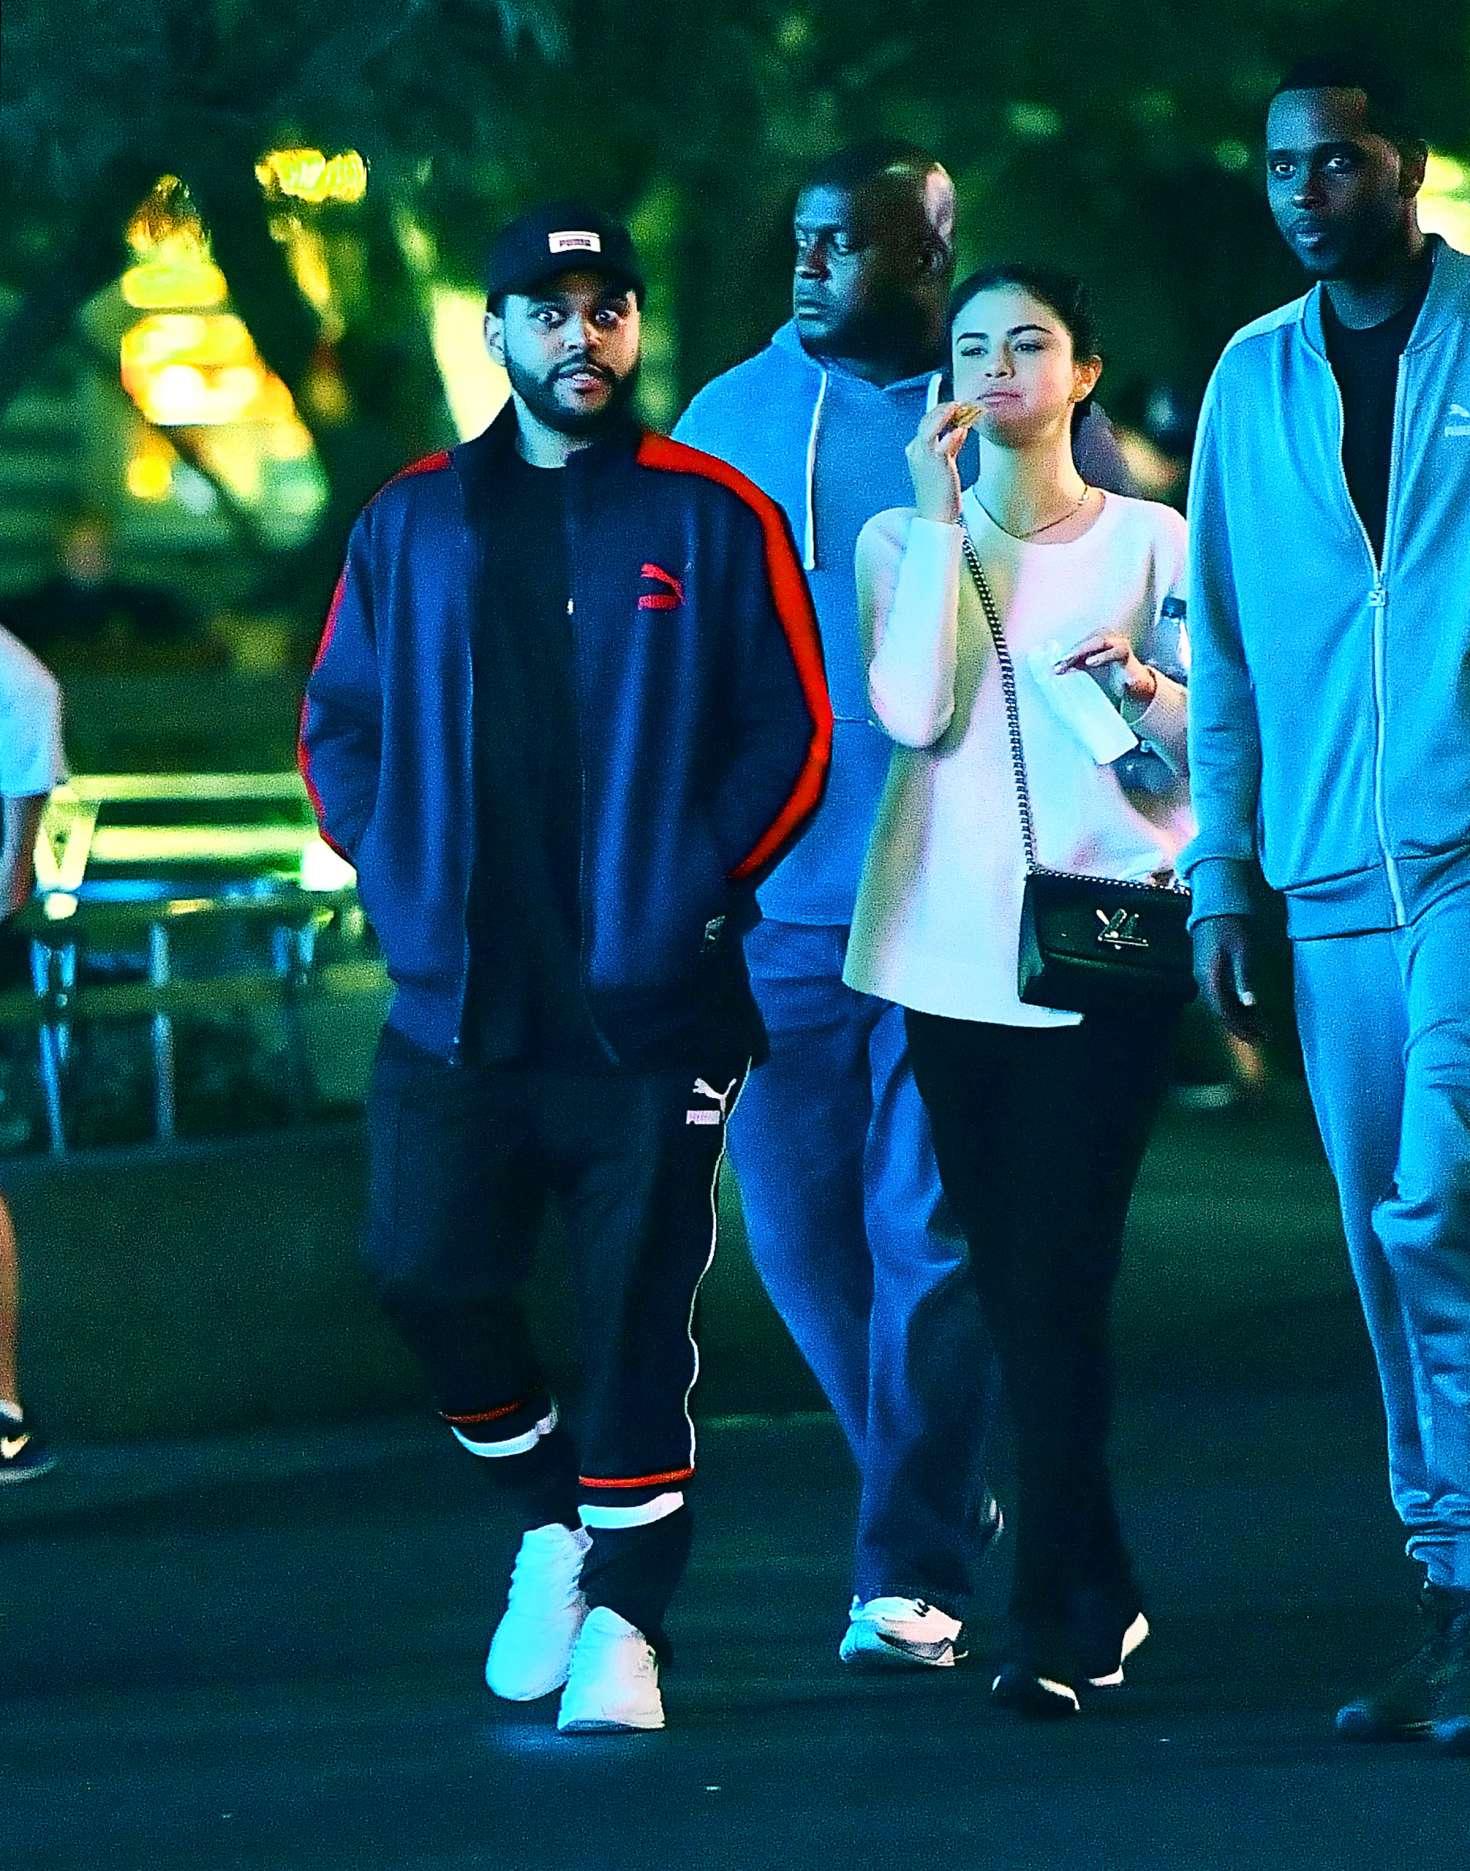 Selena Gomez 2017 : Selena Gomez and The Weeknd at Disneyland -15